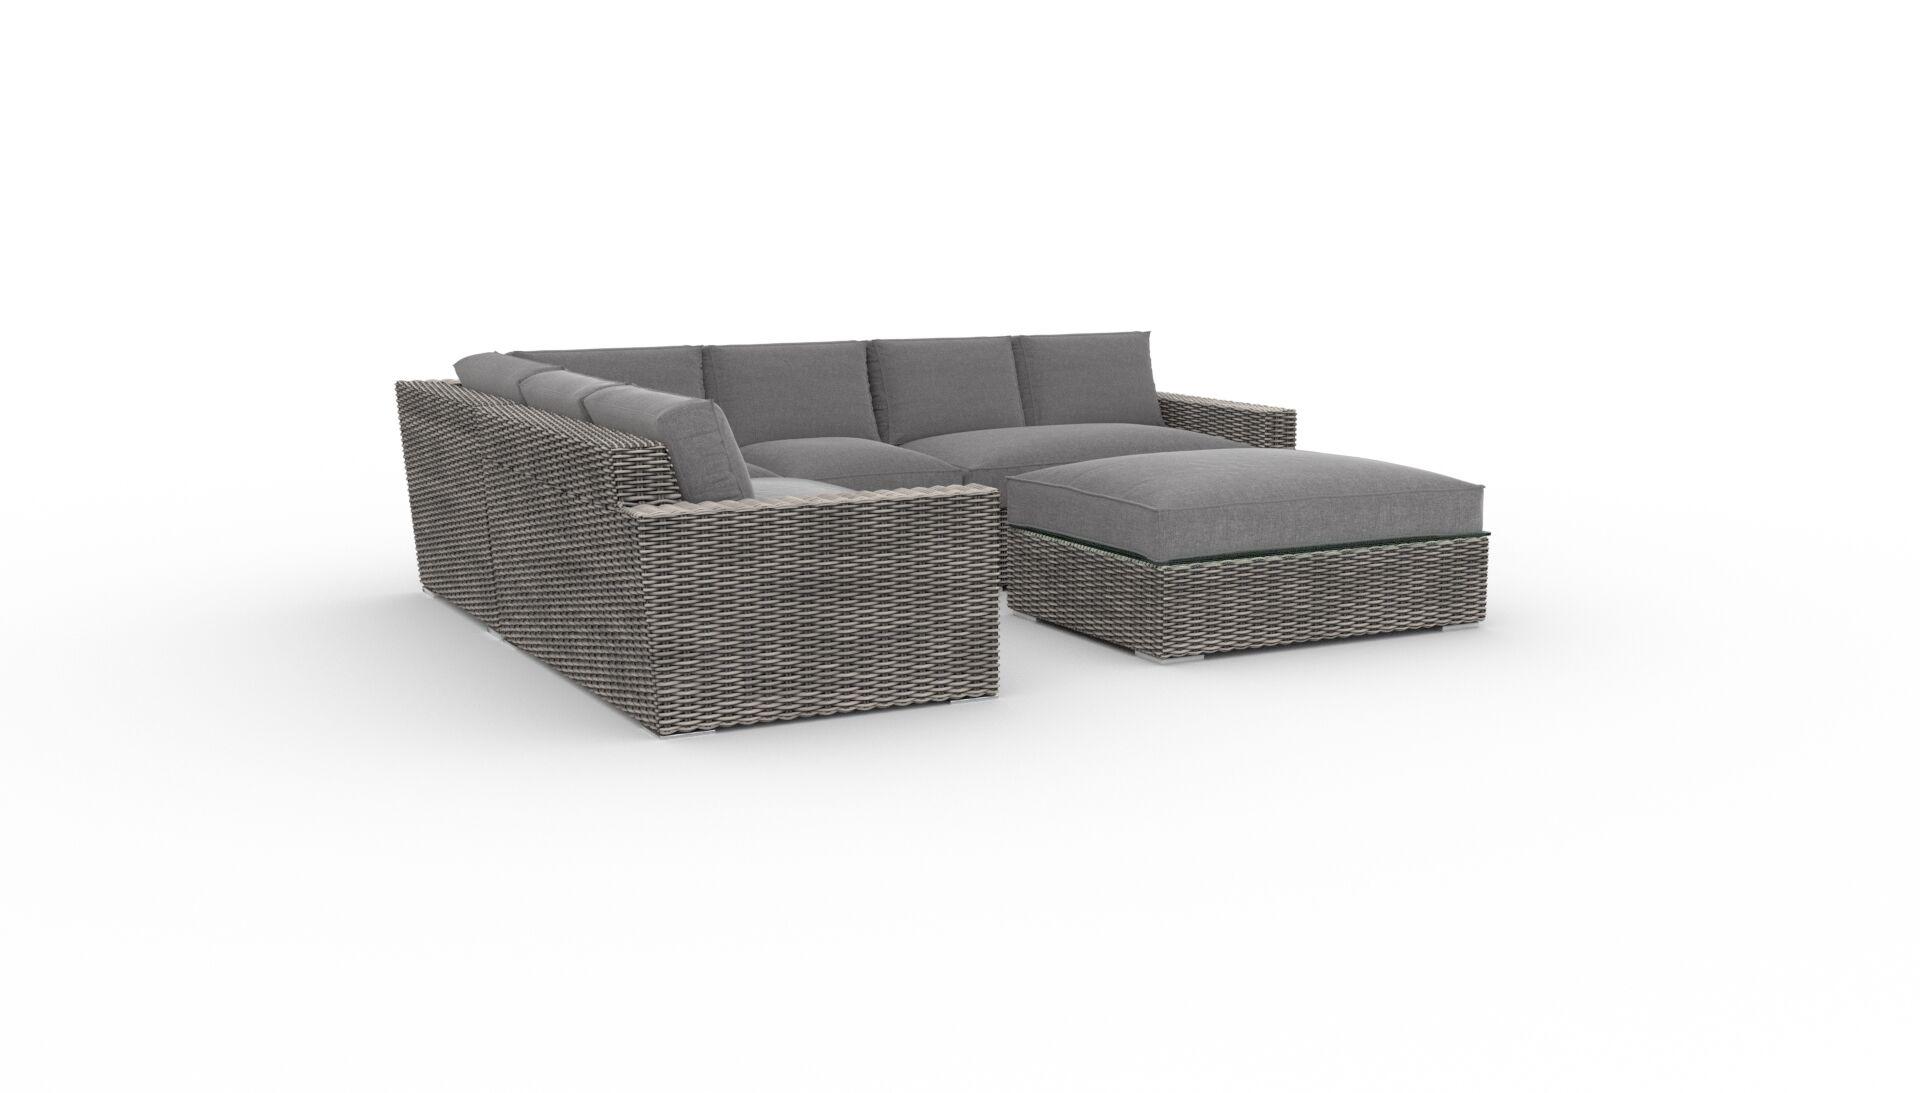 Borba Round 5 Piece Rattan Sunbrella Sectional Set with Cushions Cushion Color: Cast Slate